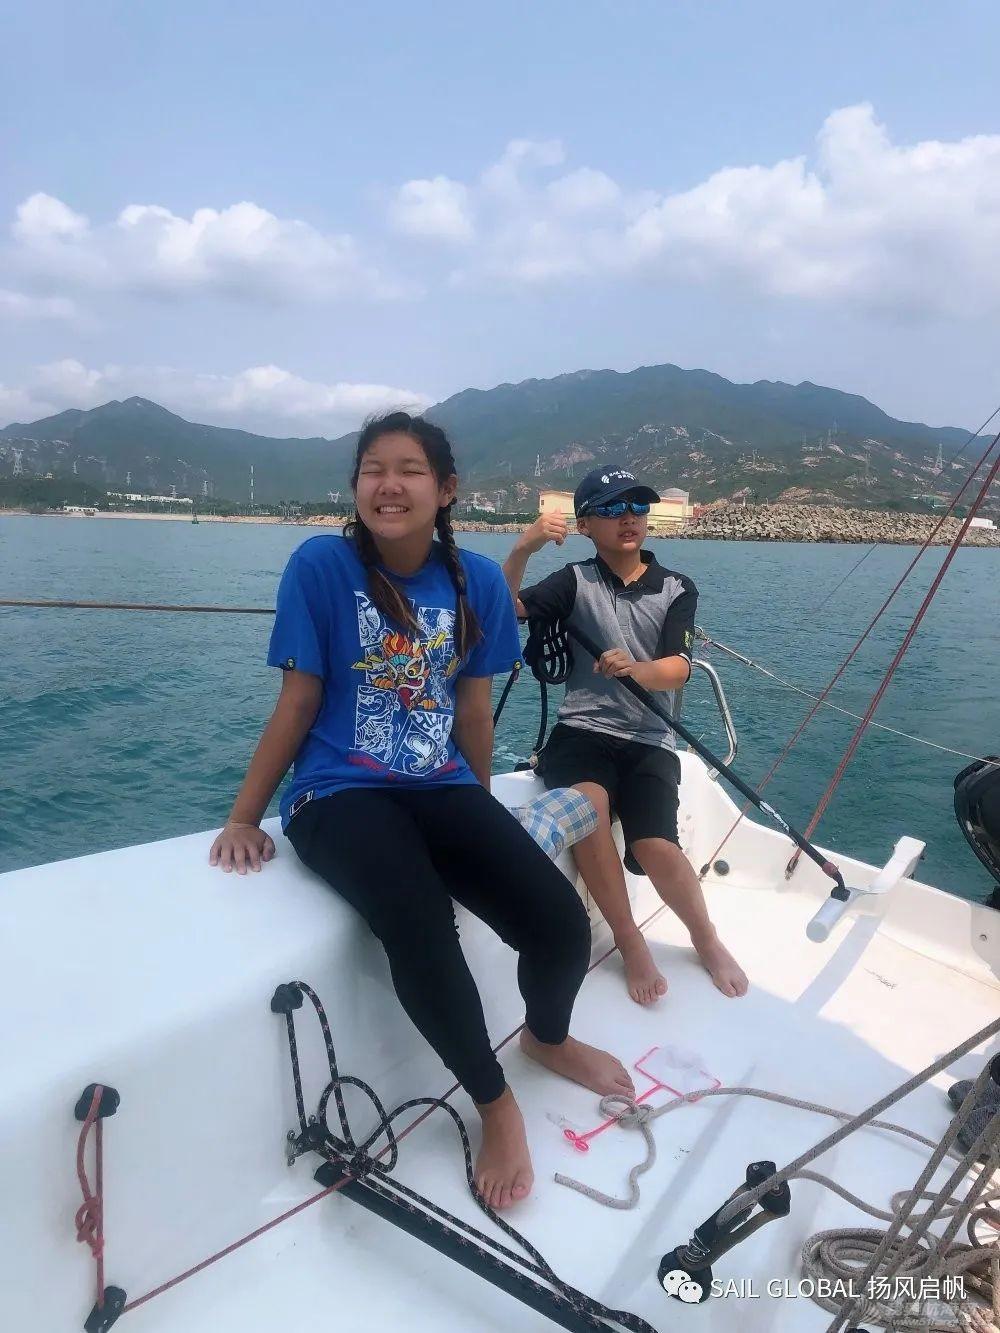 SAIL GLOBAL深圳亲子帆船课:扬帆逐梦,陪伴成长w5.jpg